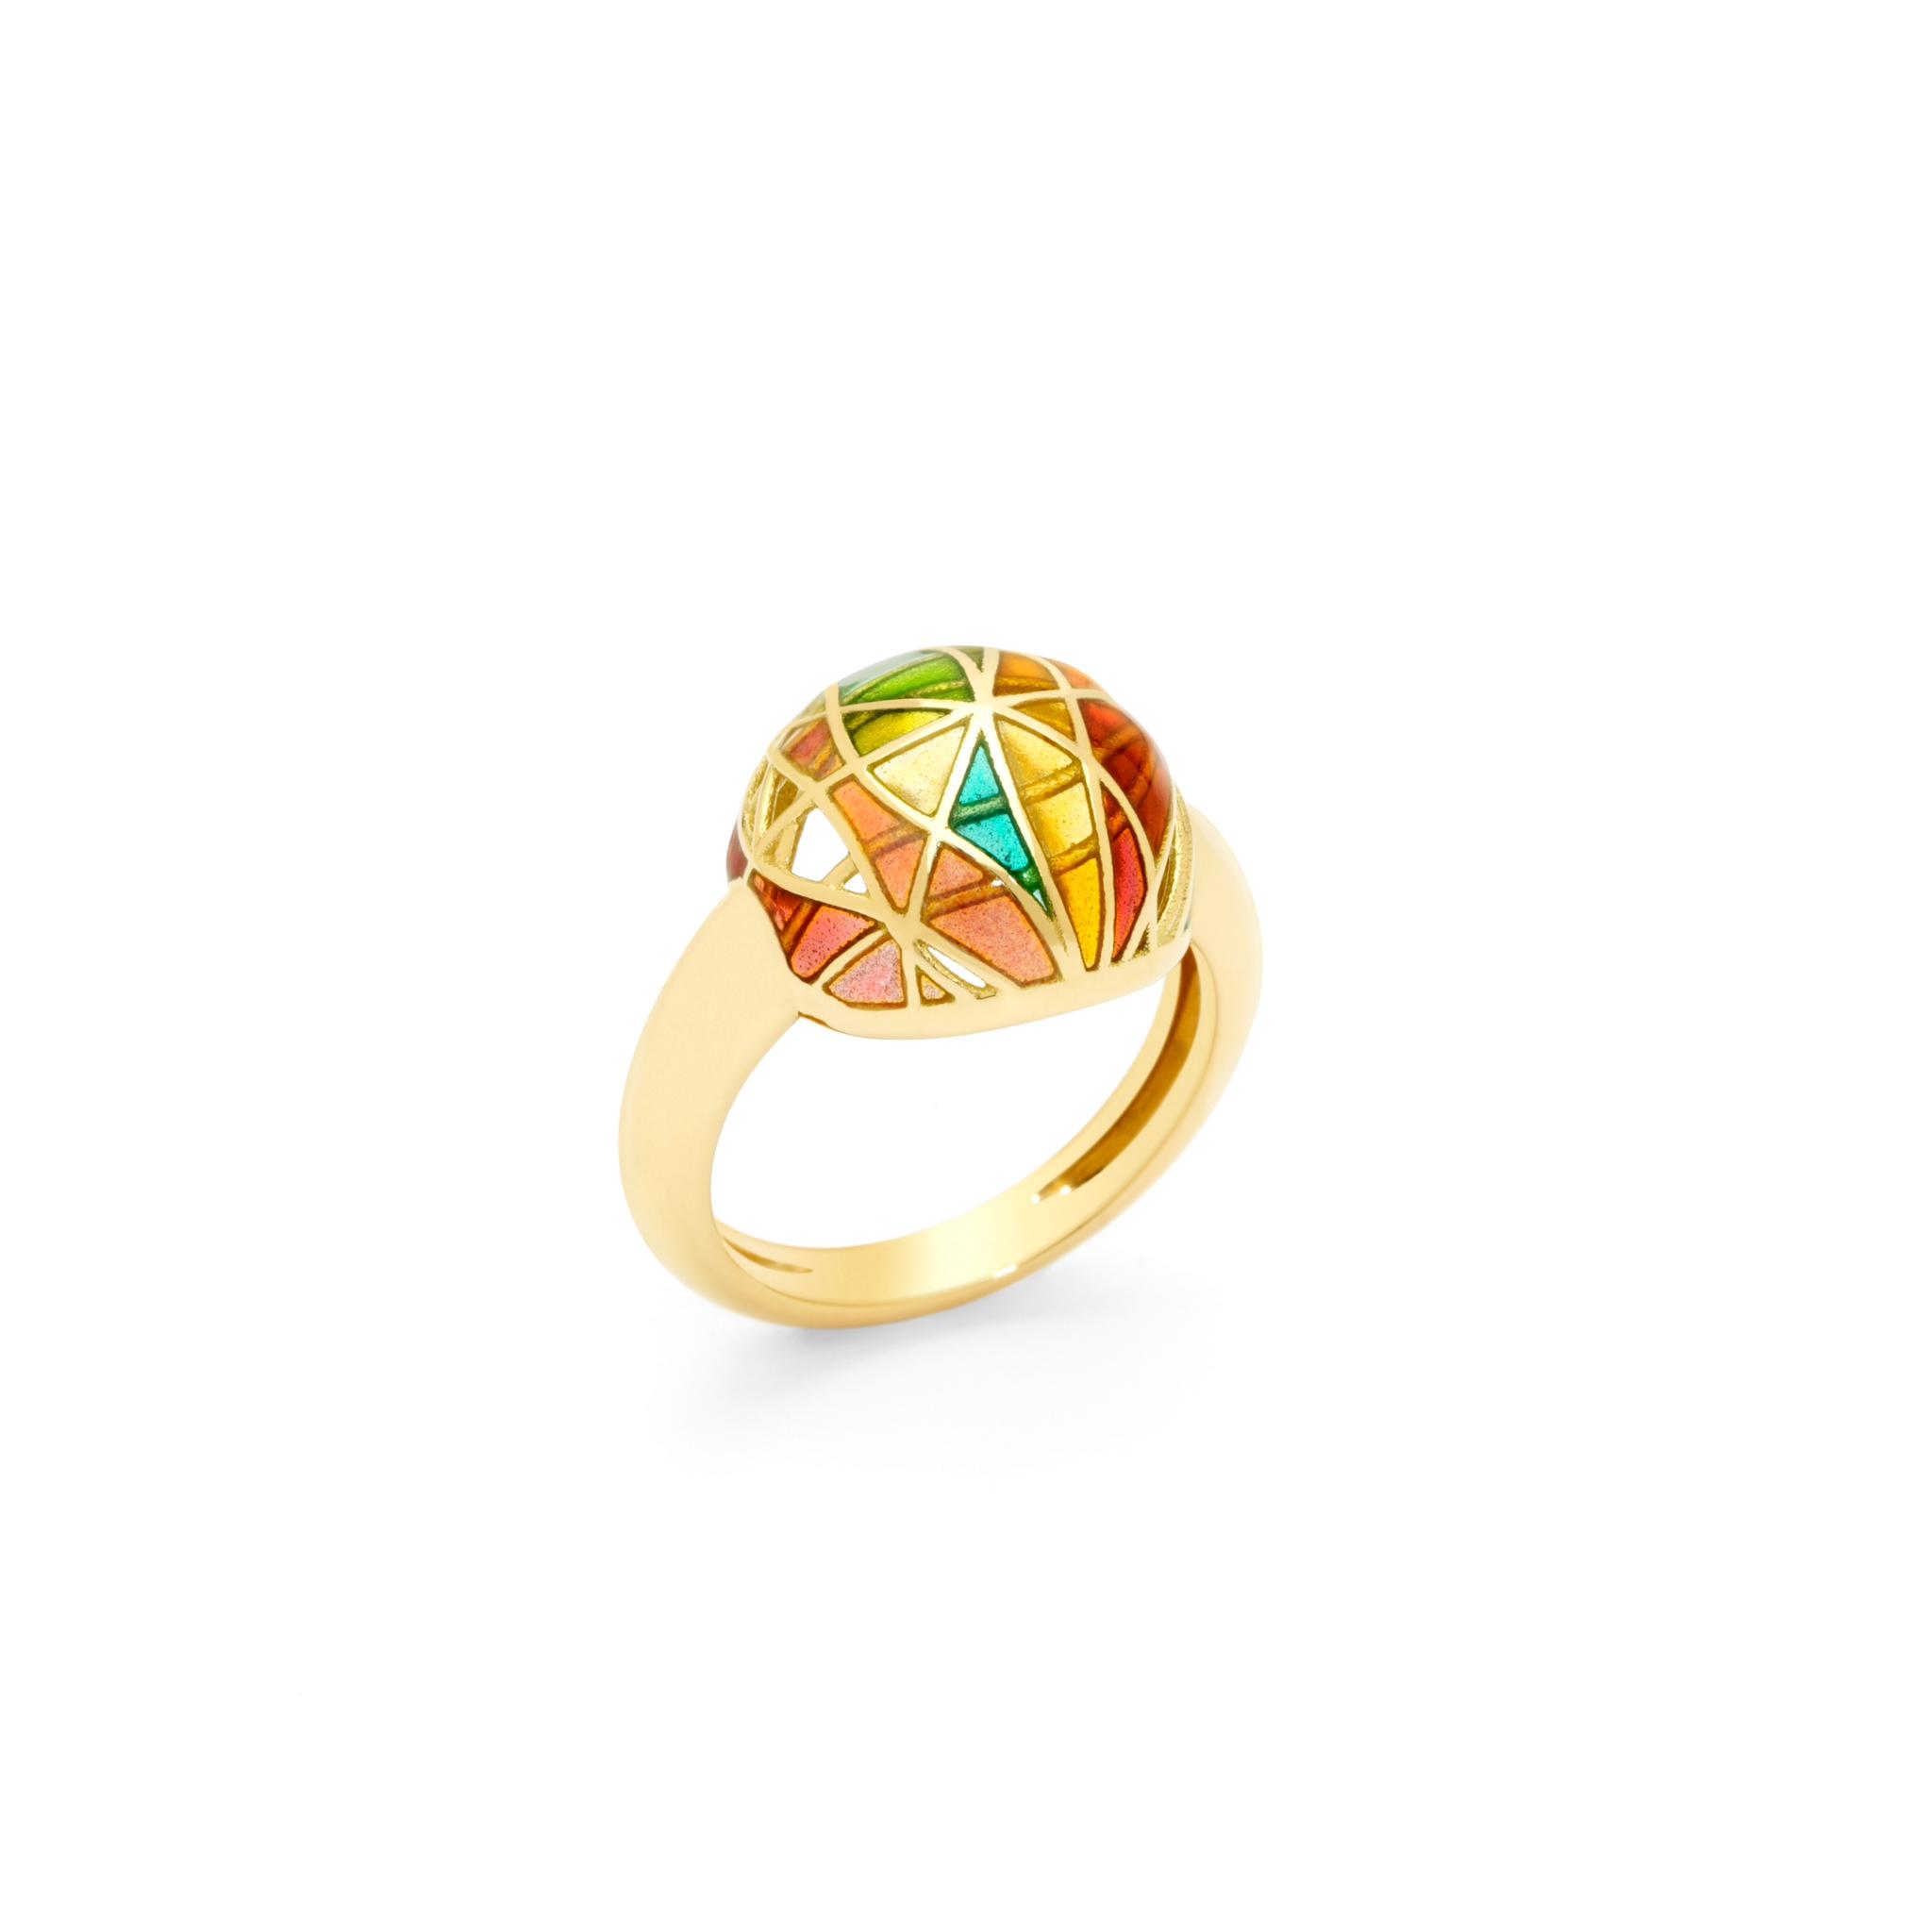 Autumn Sphere Ring